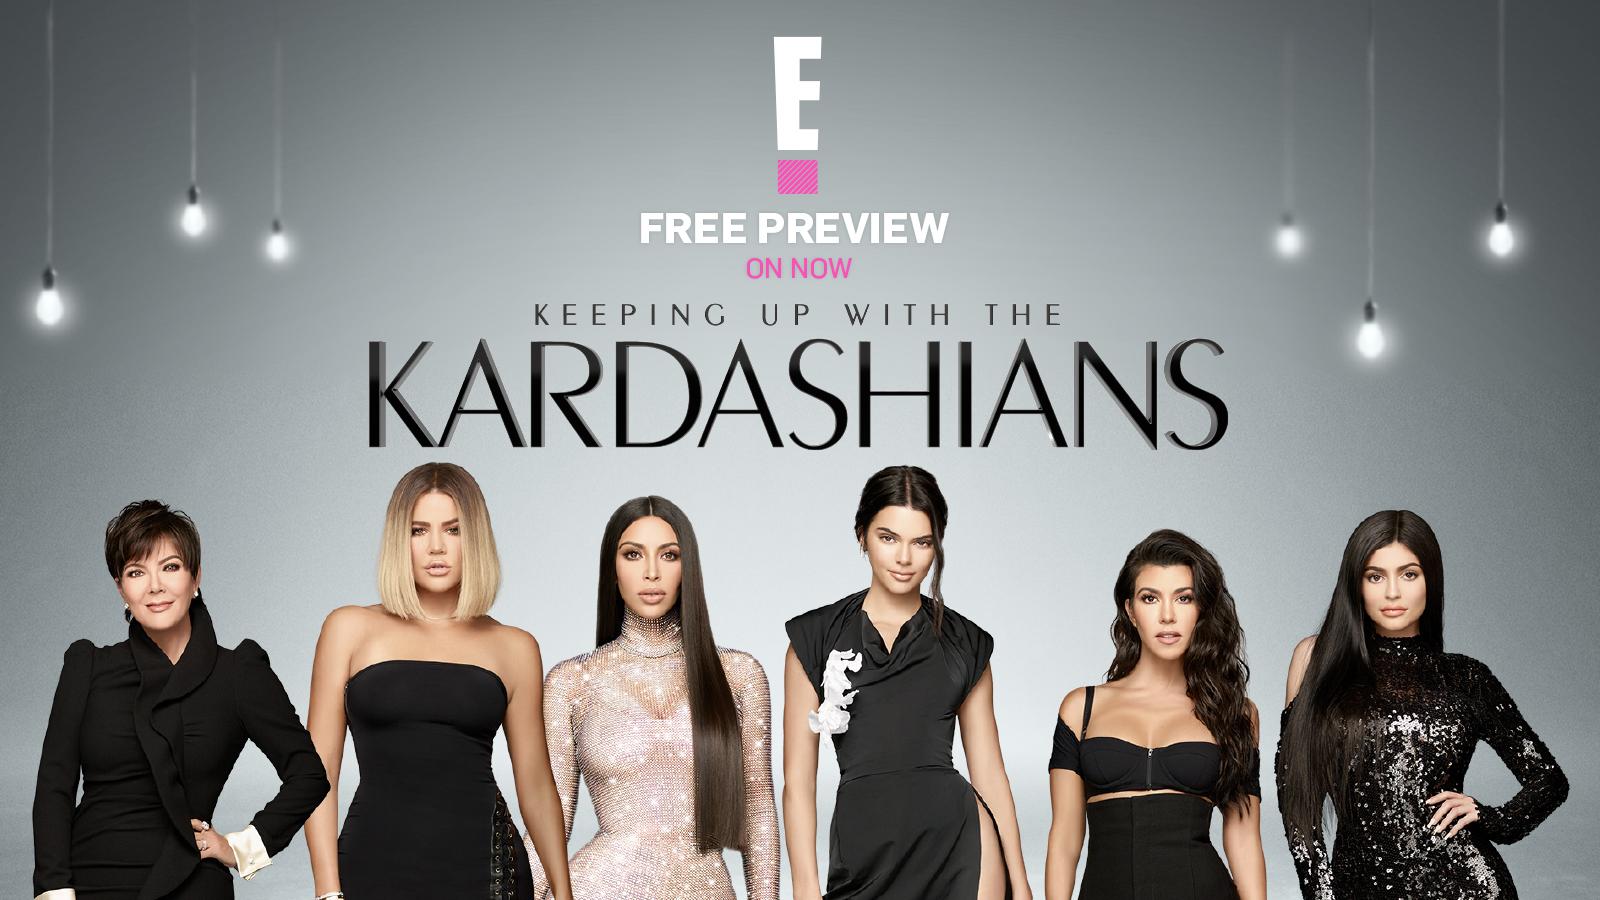 E! free preview